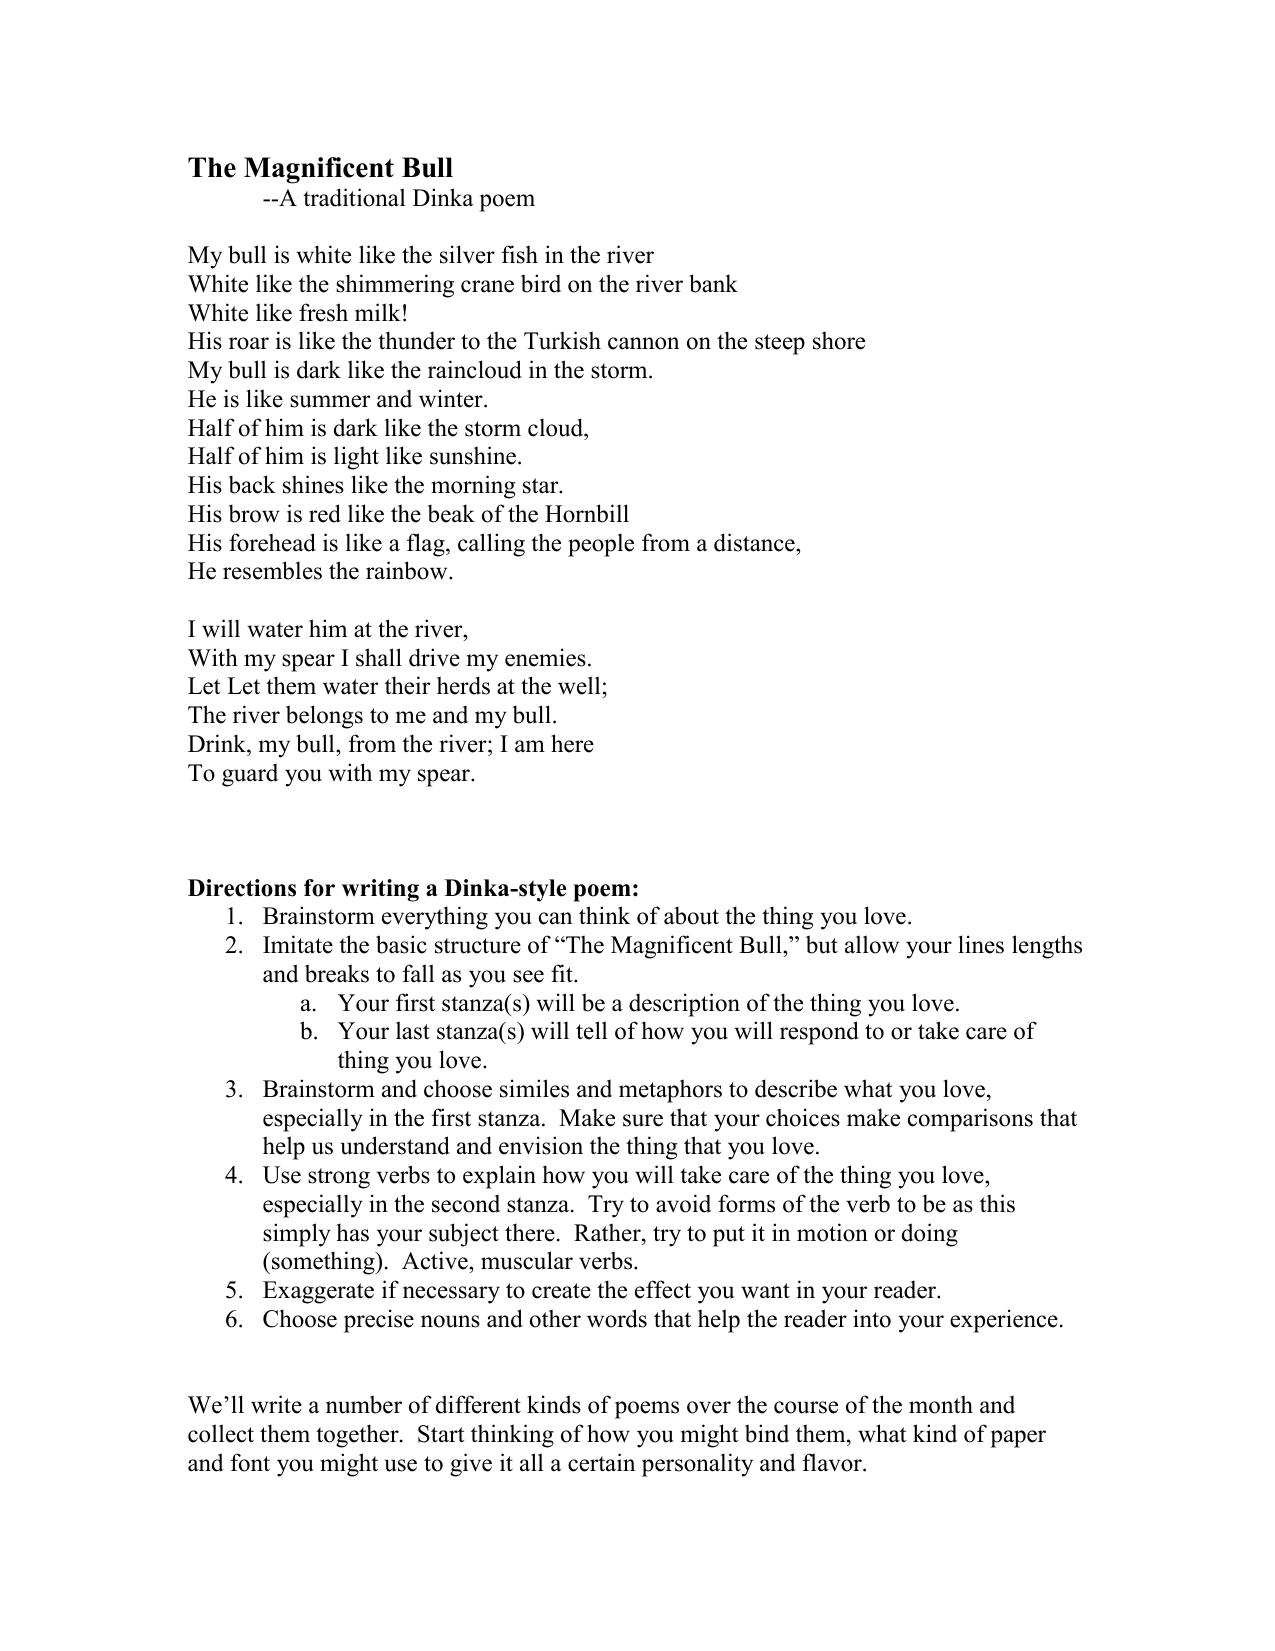 writing Dinka Poems dinka_poems